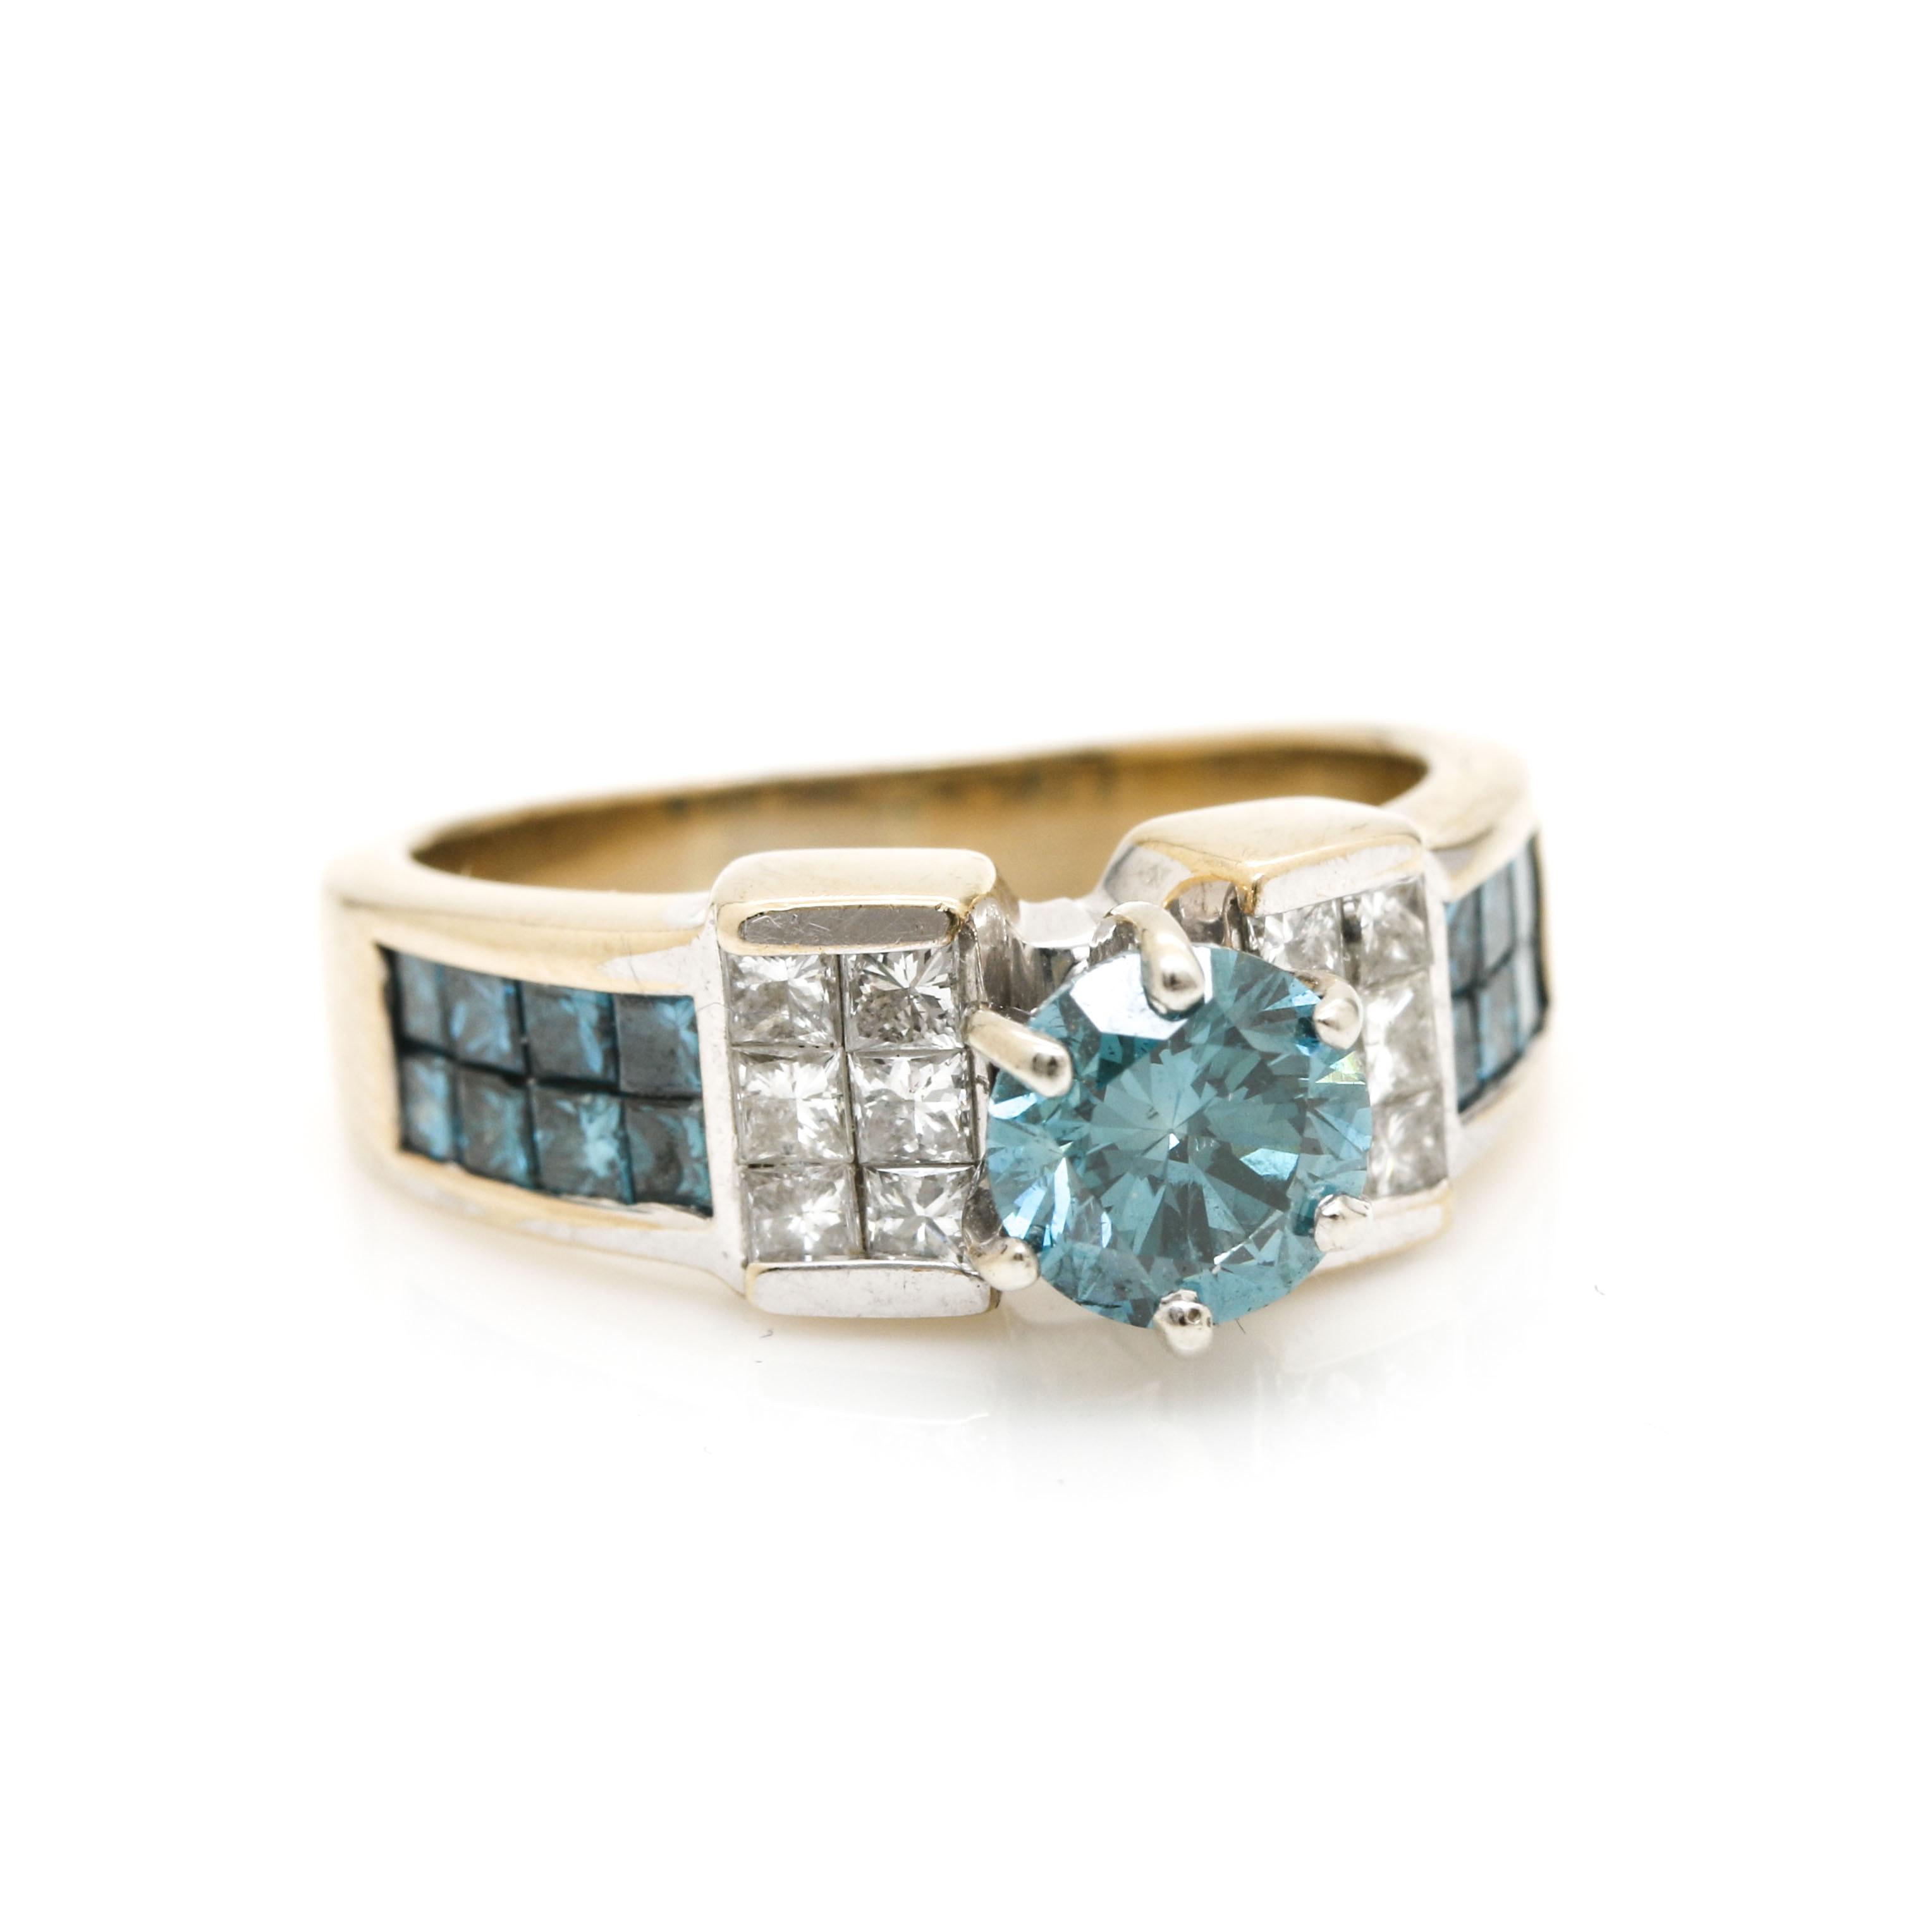 18K Yellow Gold 2.36 CTW Diamond Ring